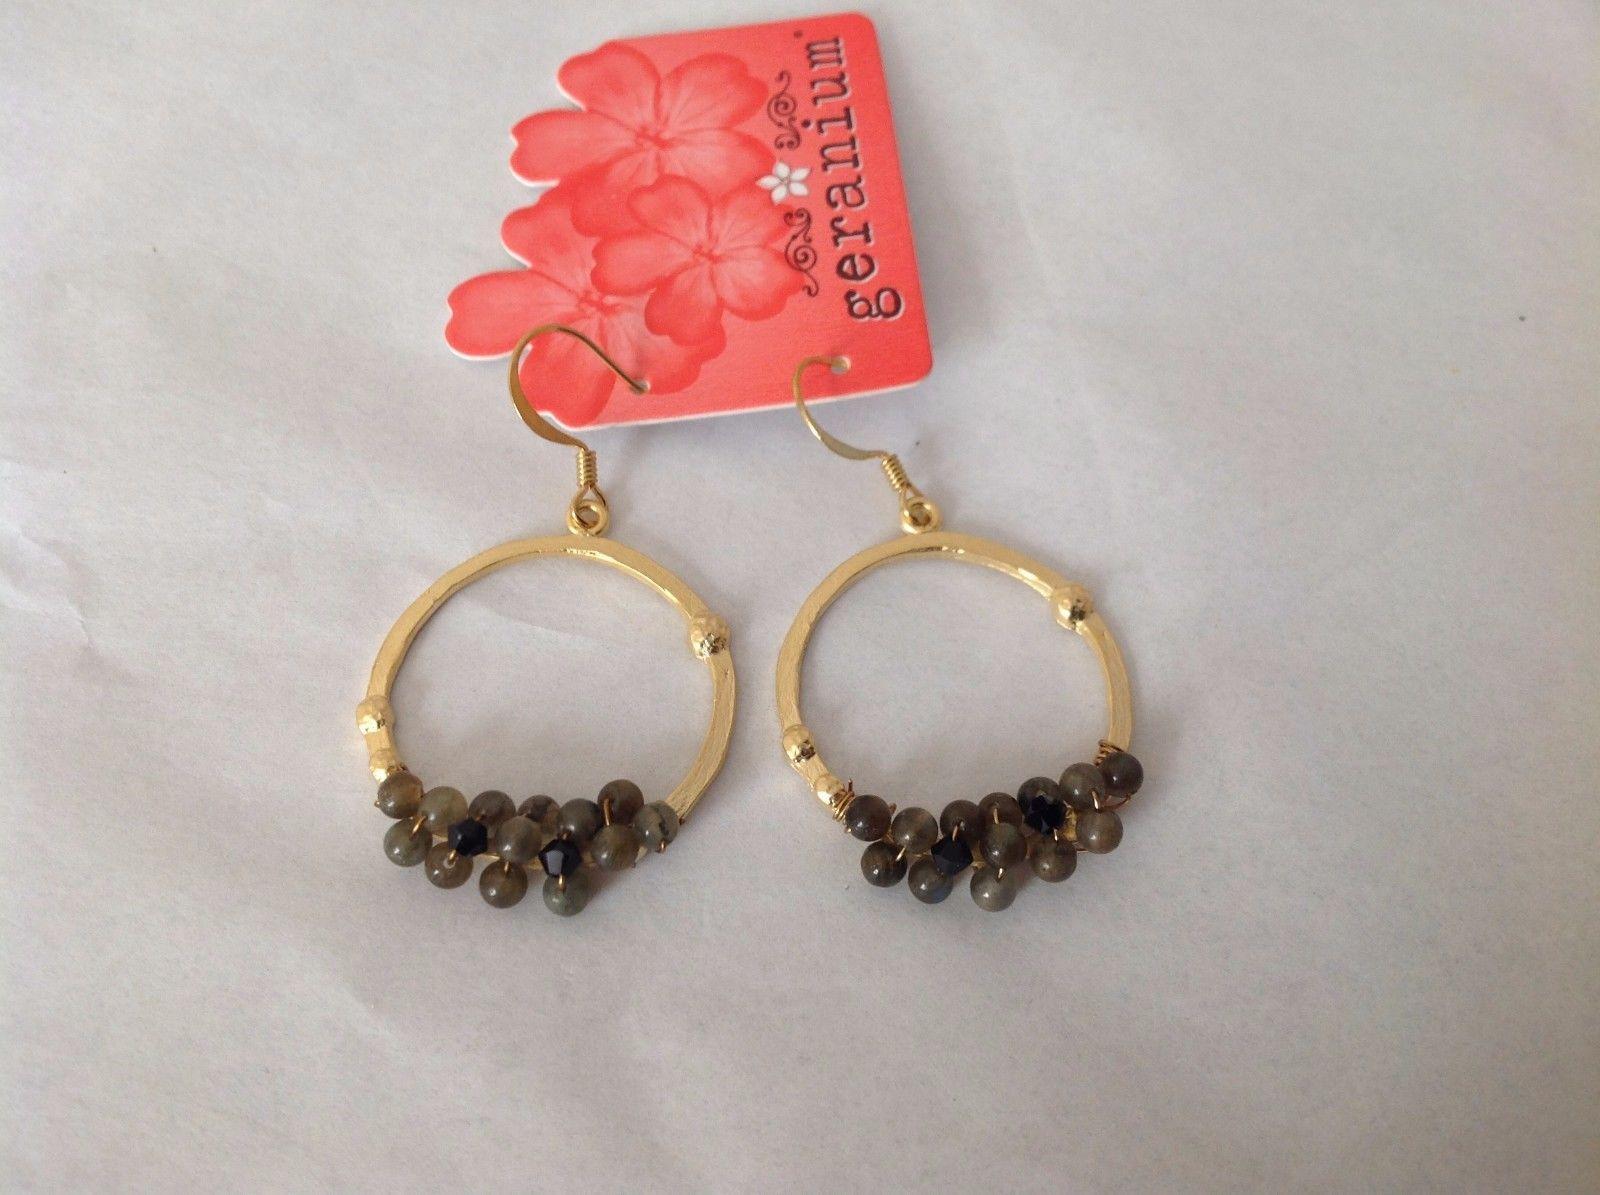 NEW Geranium Gold Toned Dangling Earrings Dark Gray Black Stones Ring Earrings